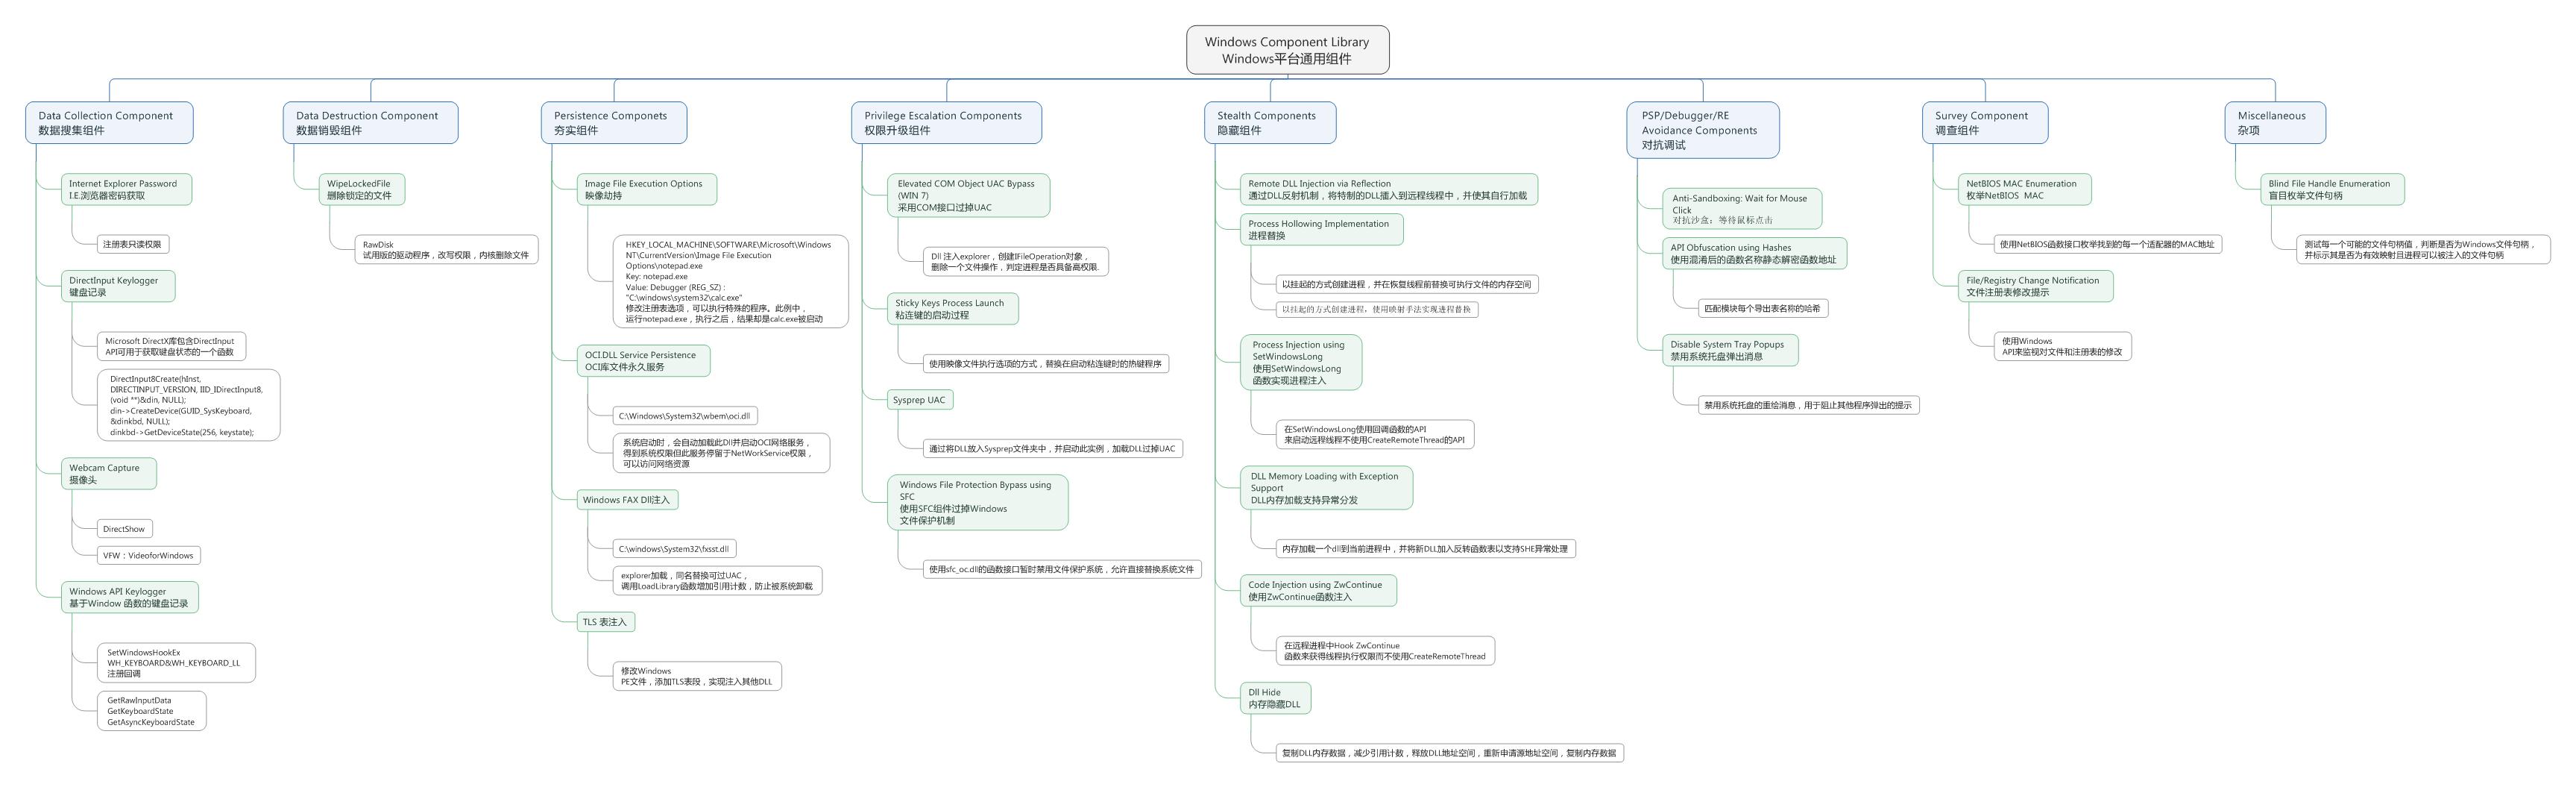 CIA泄露资料分析(黑客工具&技术)—Windows篇